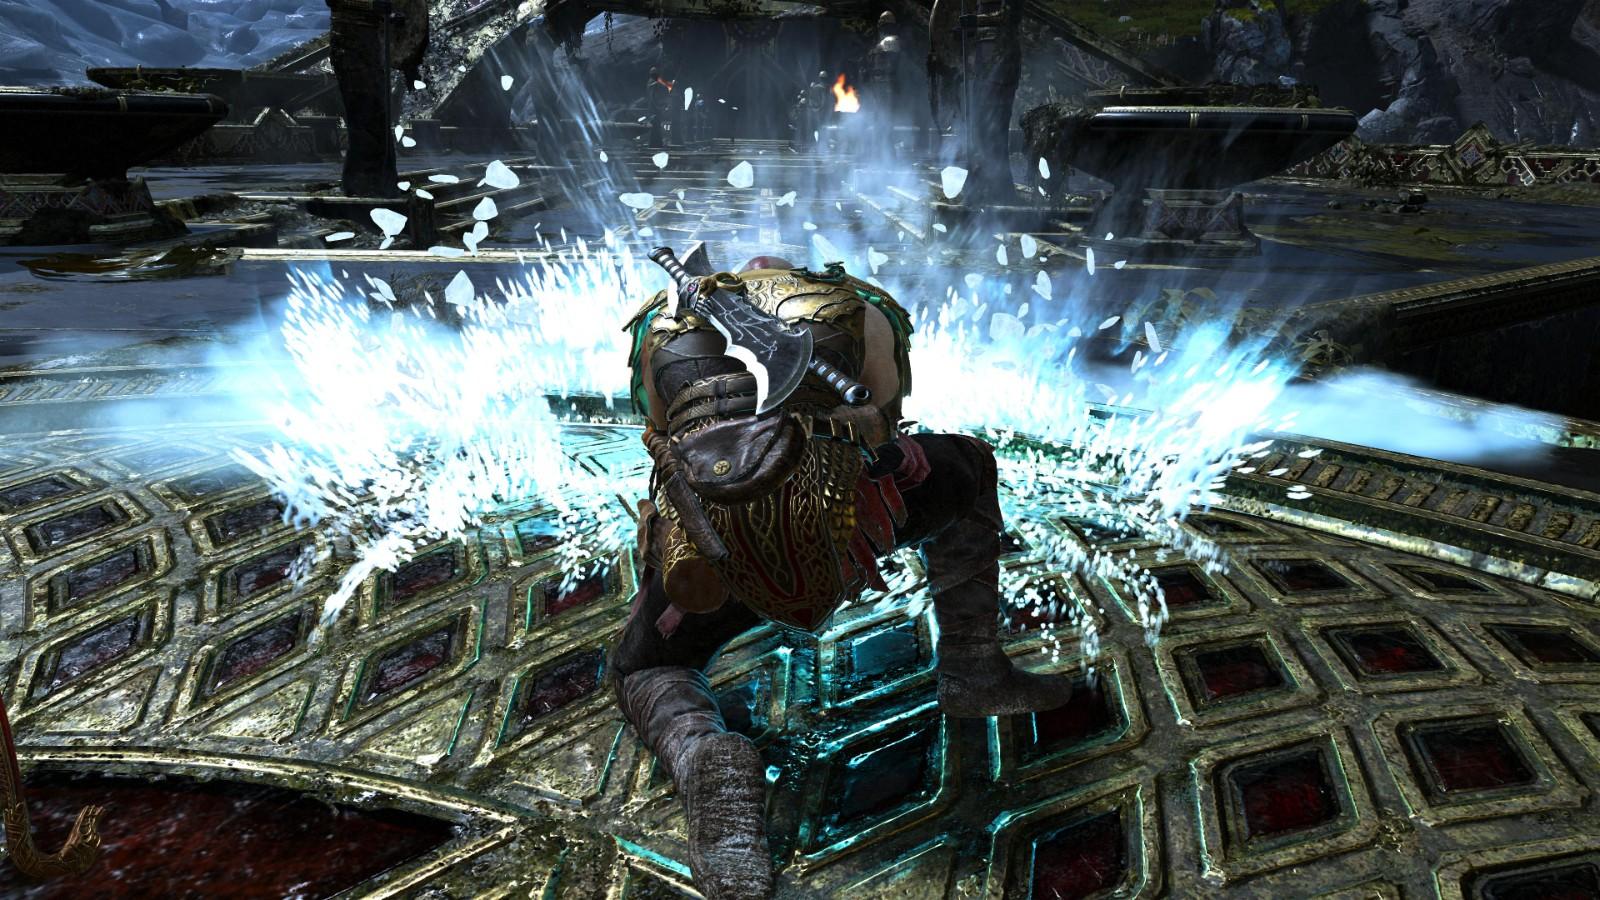 Xbox负责人Phil Spencer为战神总监领导魄力点赞